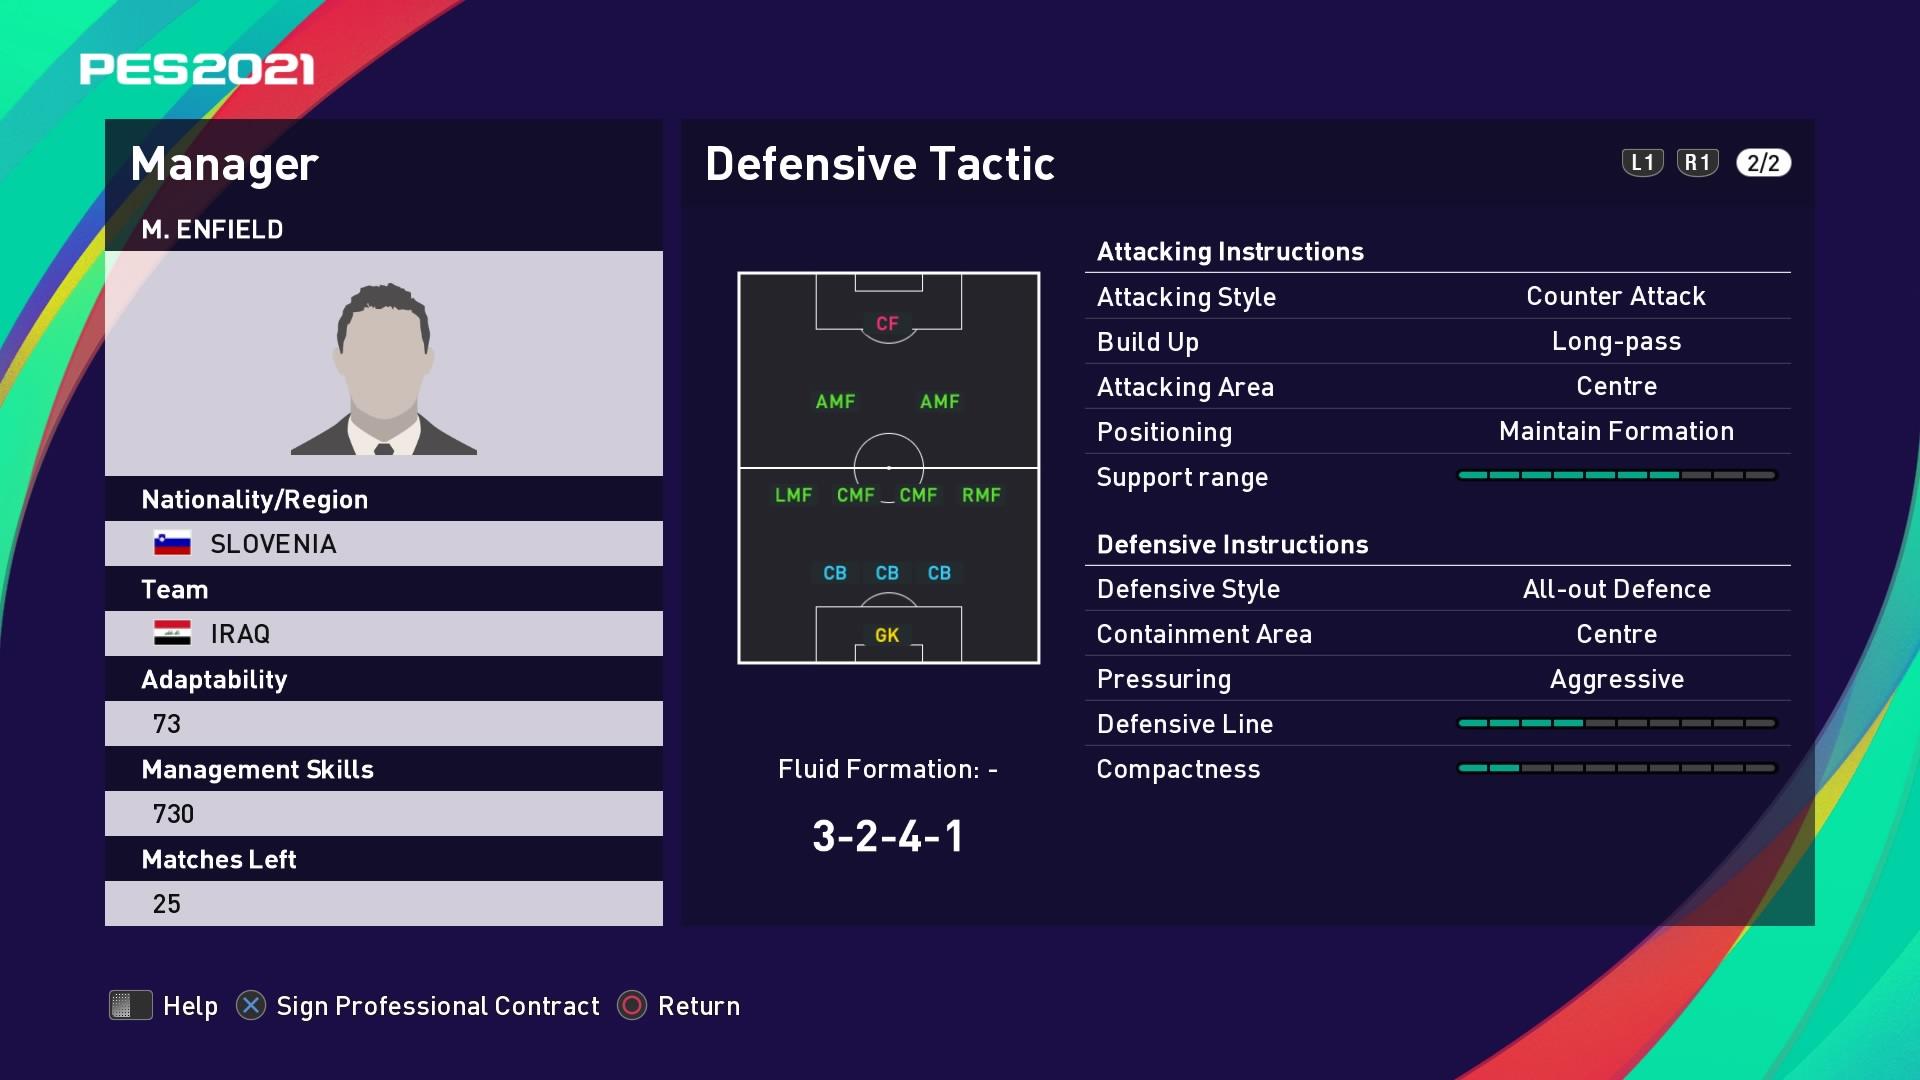 M. Enfield (Srečko Katanec) Defensive Tactic in PES 2021 myClub